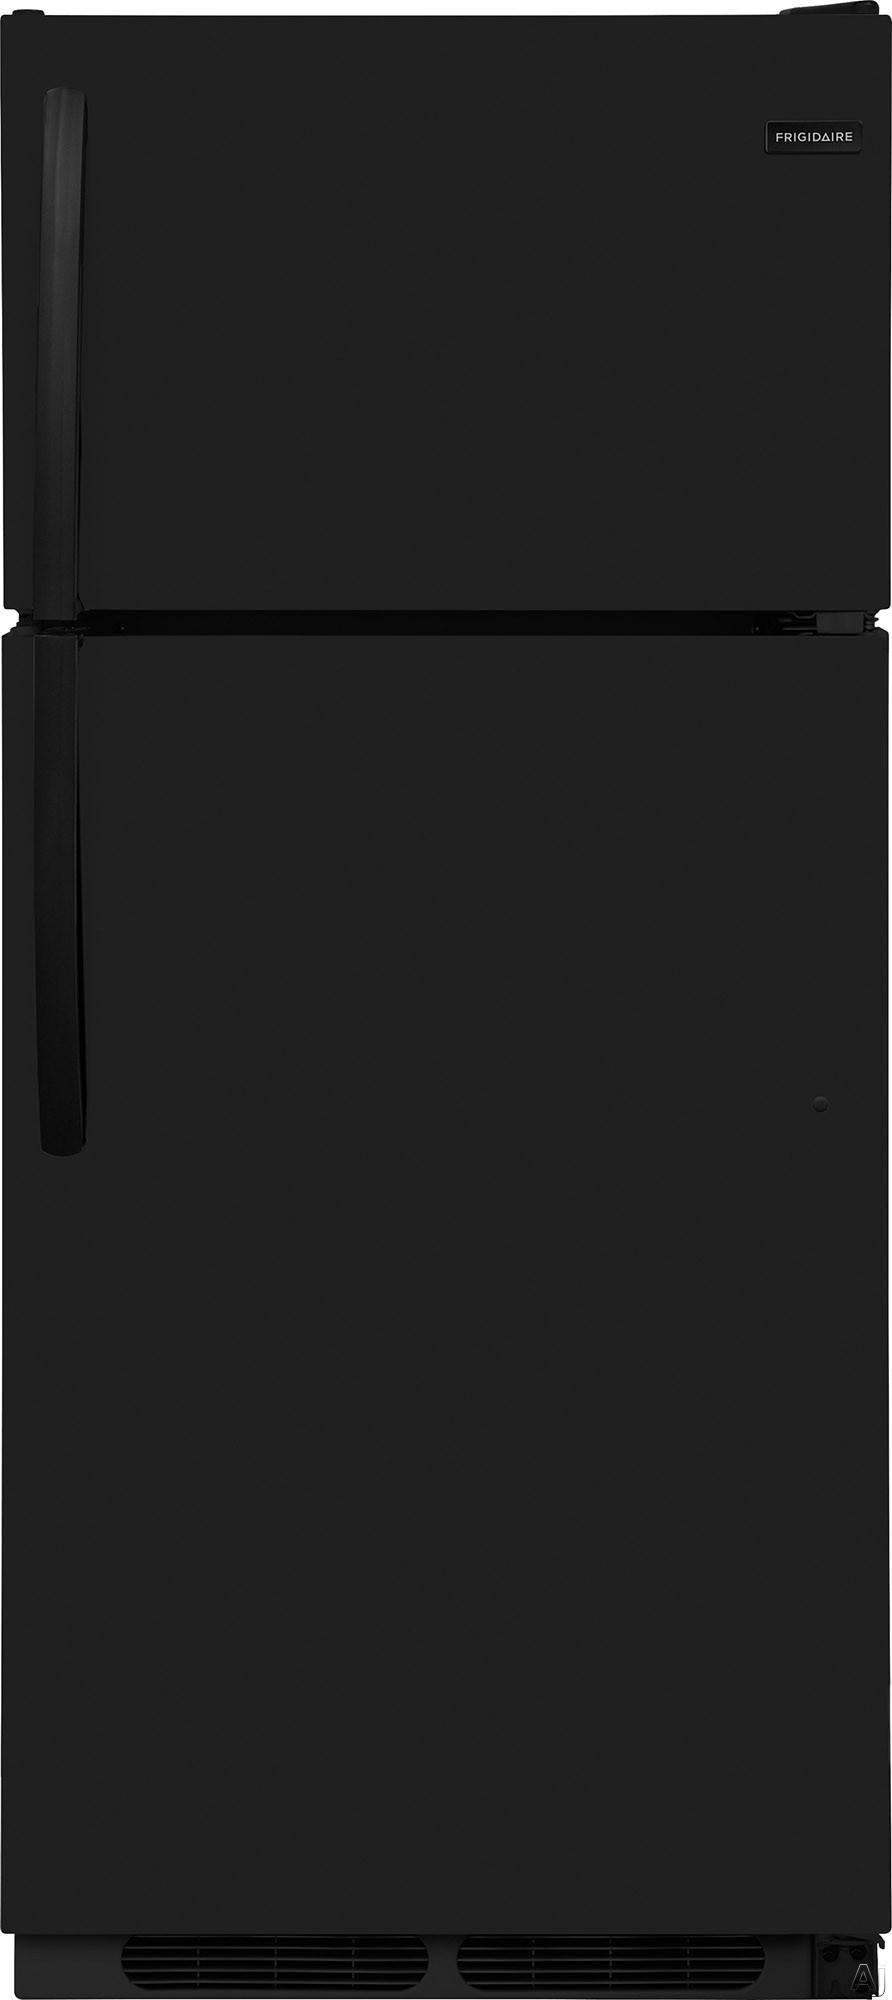 "Frigidaire FFHT1614TB 28 Inch Top-Freezer Refrigerator with Store-Moreâ""¢ Crispers, Store-Moreâ""¢ Gallon Shelf, Reversible Door, Clear Dairy Bin, Full Width Freezer Shelf, ADA Compliant and Energy Star: Black"